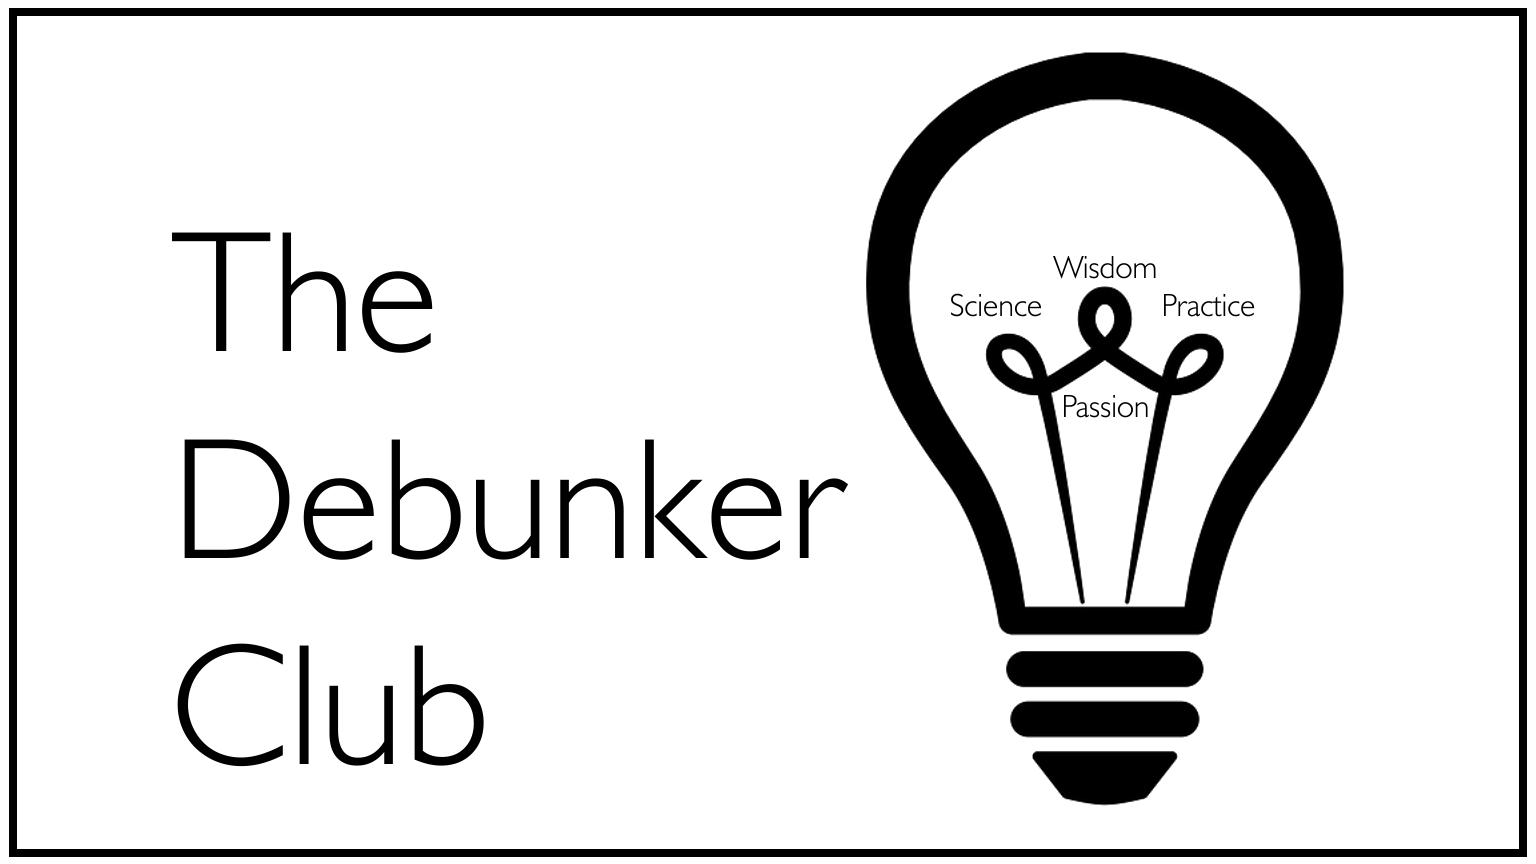 The Debunker Club